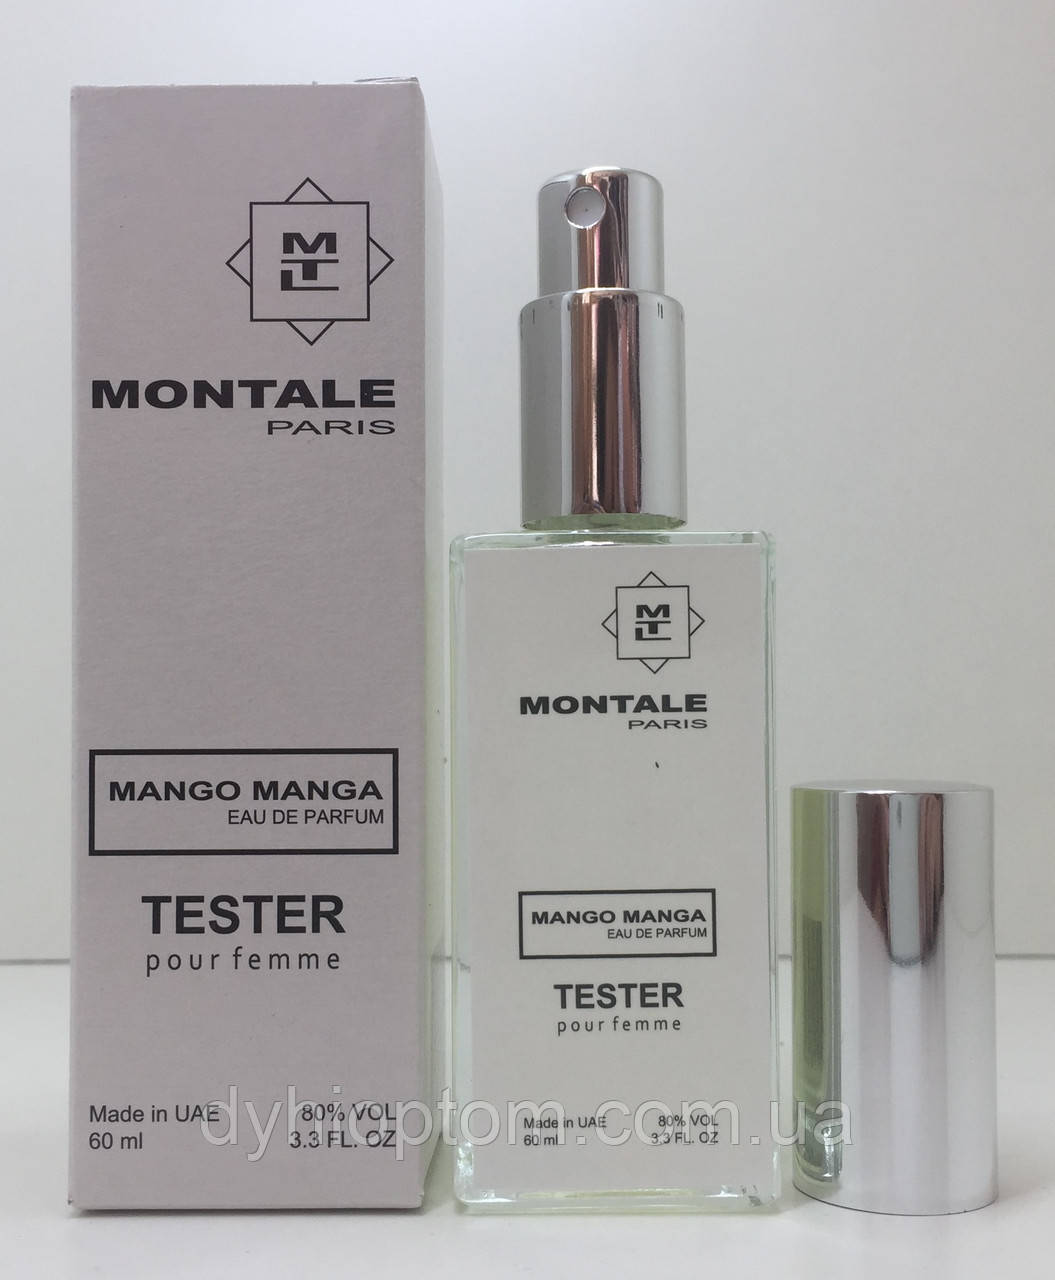 Тестер женский Montale Mango Manga (Монталь Манго Манга) 60 мл